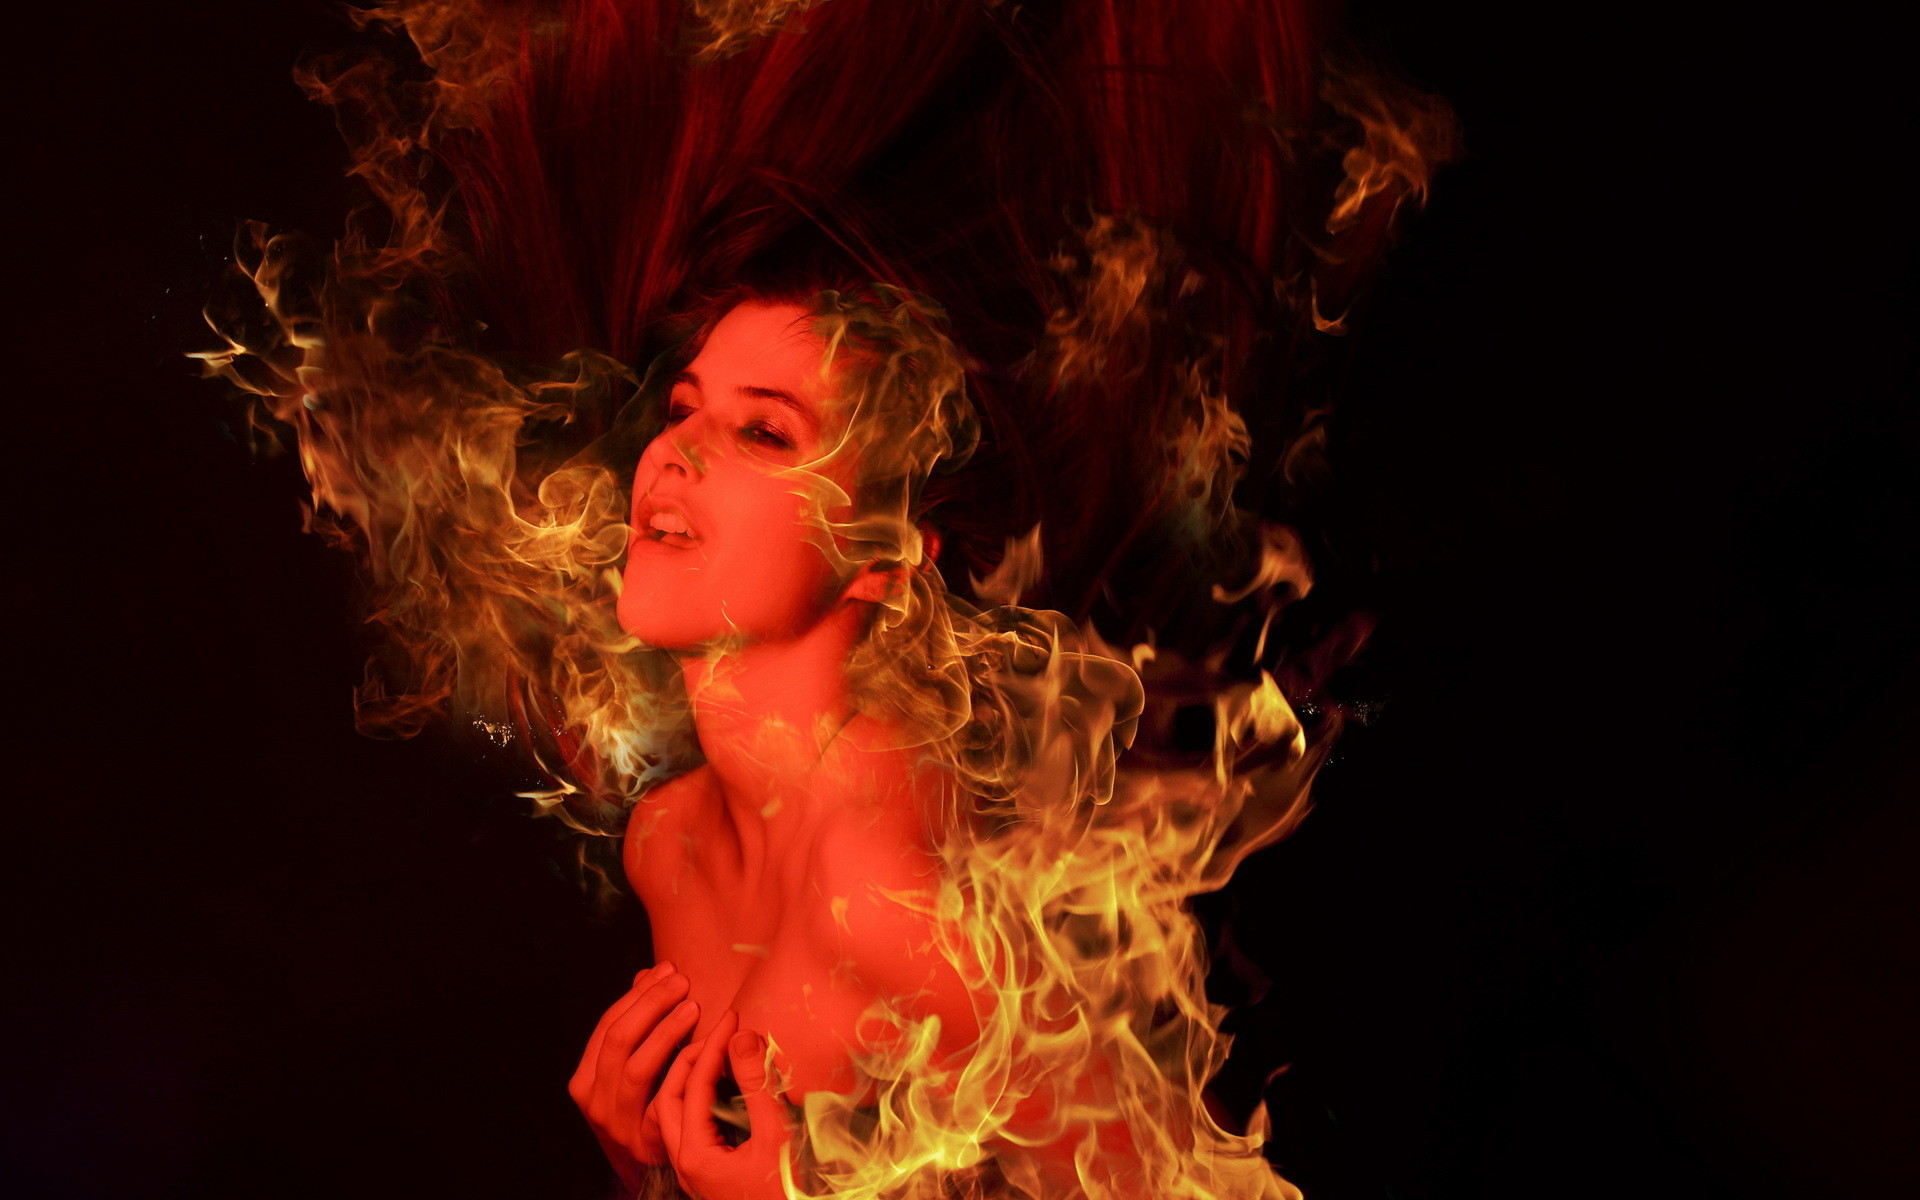 Girl Fire Love Dark Demon Fantasy Wallpaper At Dark Wallpapers